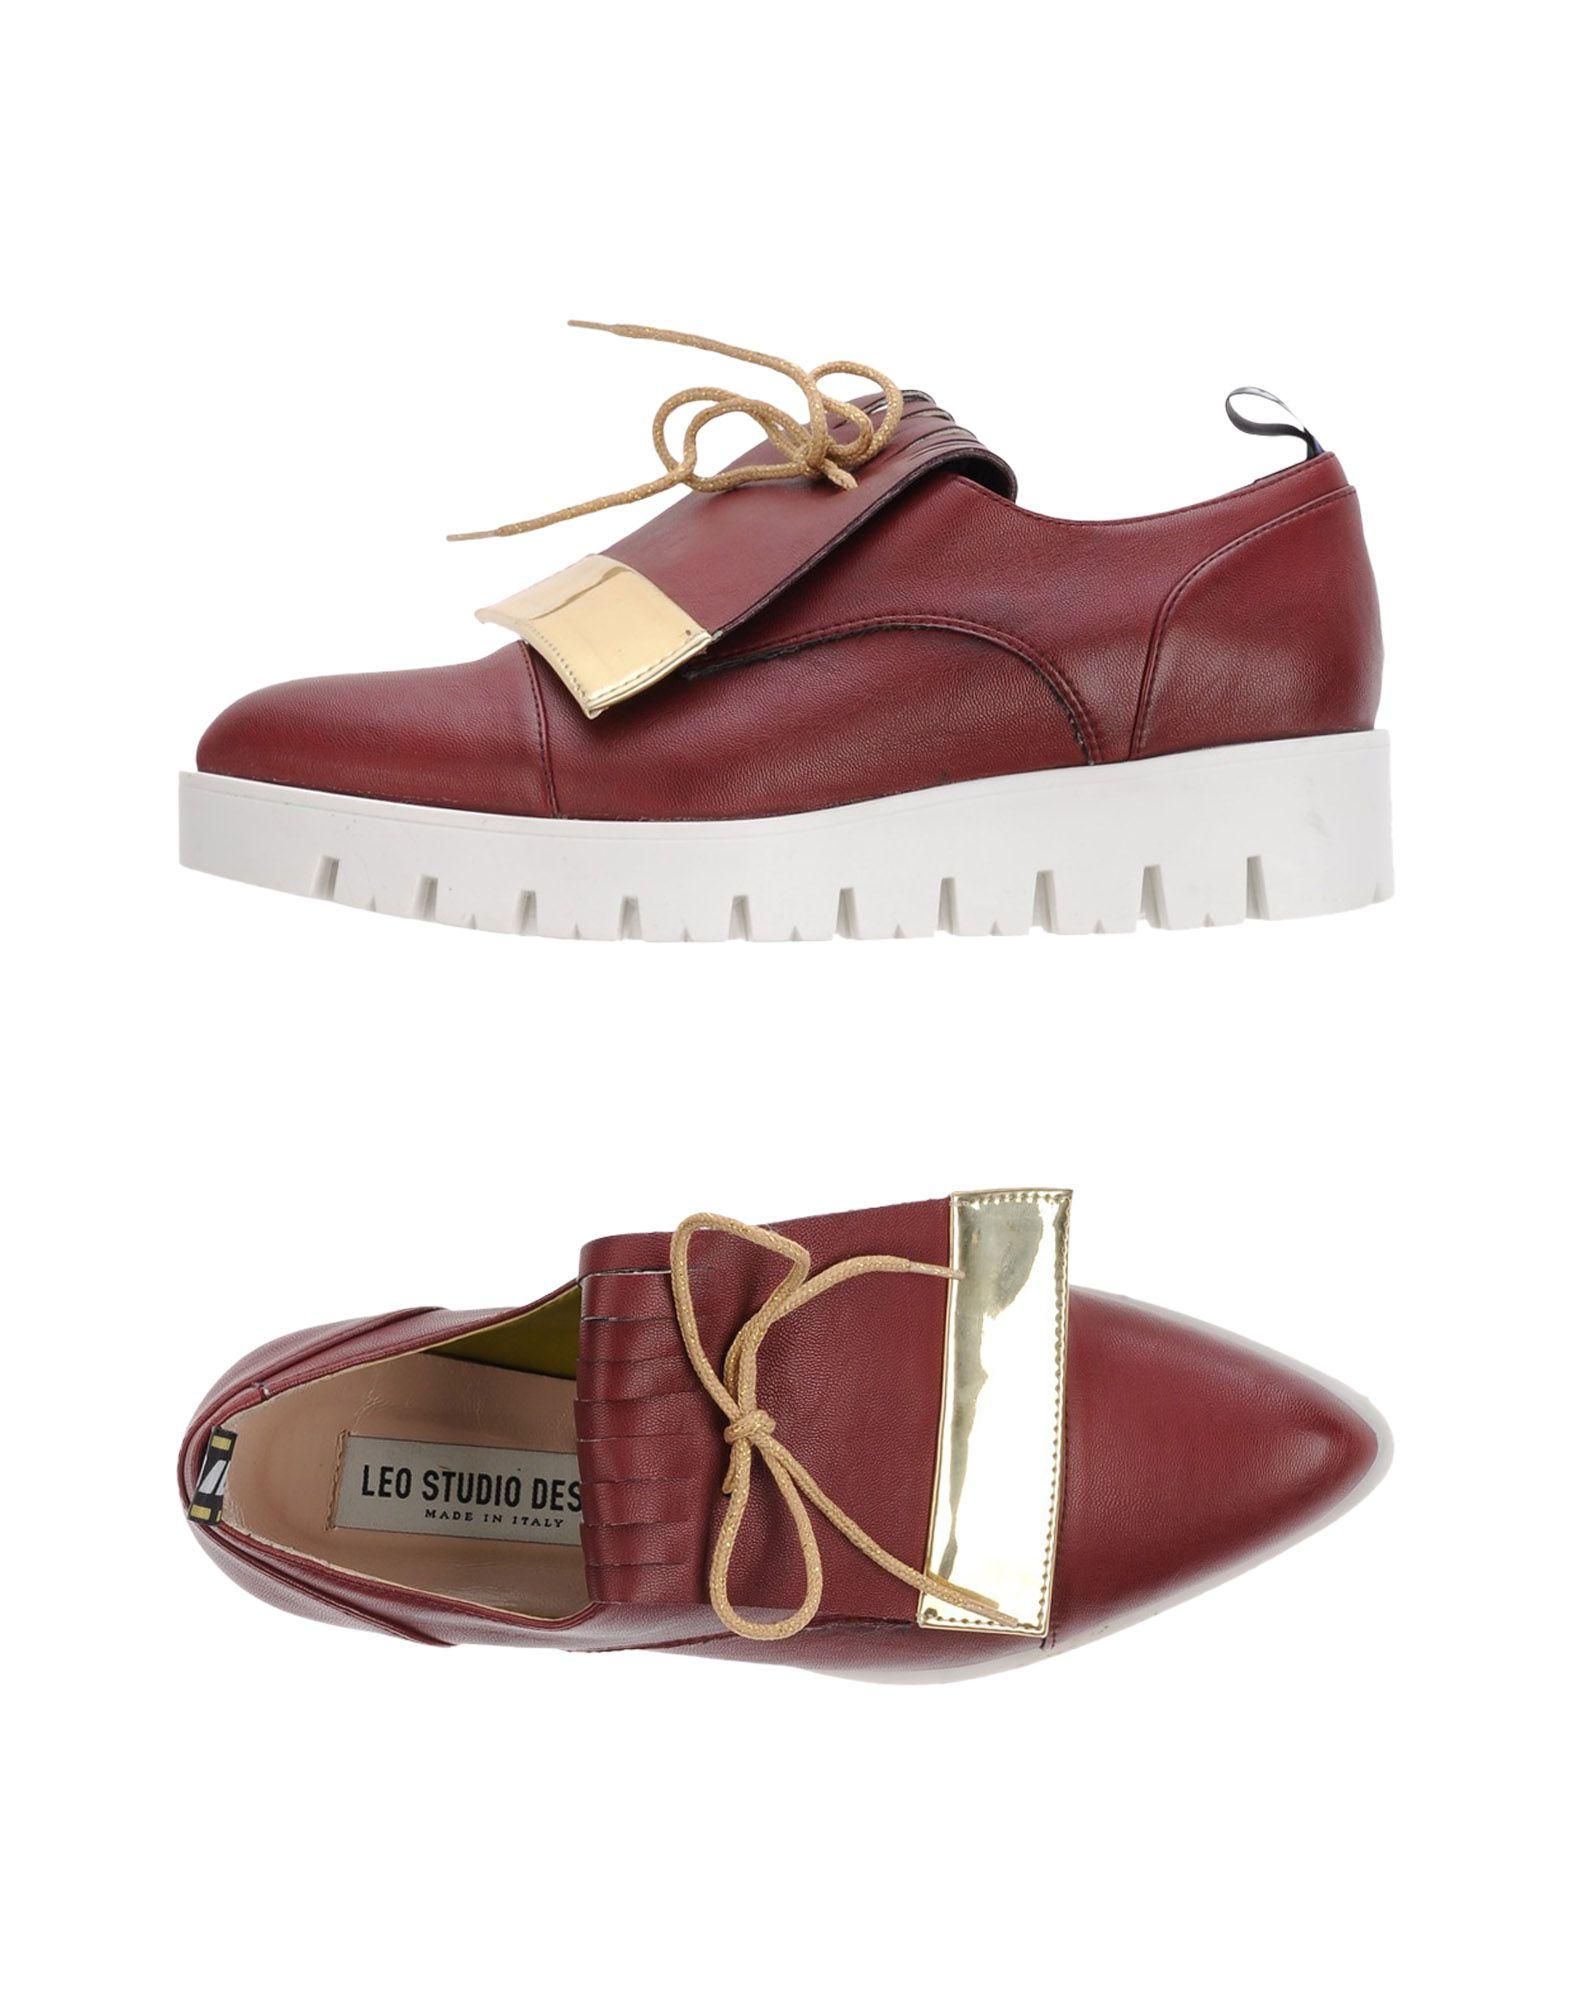 LEO STUDIO DESIGN Обувь на шнурках my studio обувь на шнурках